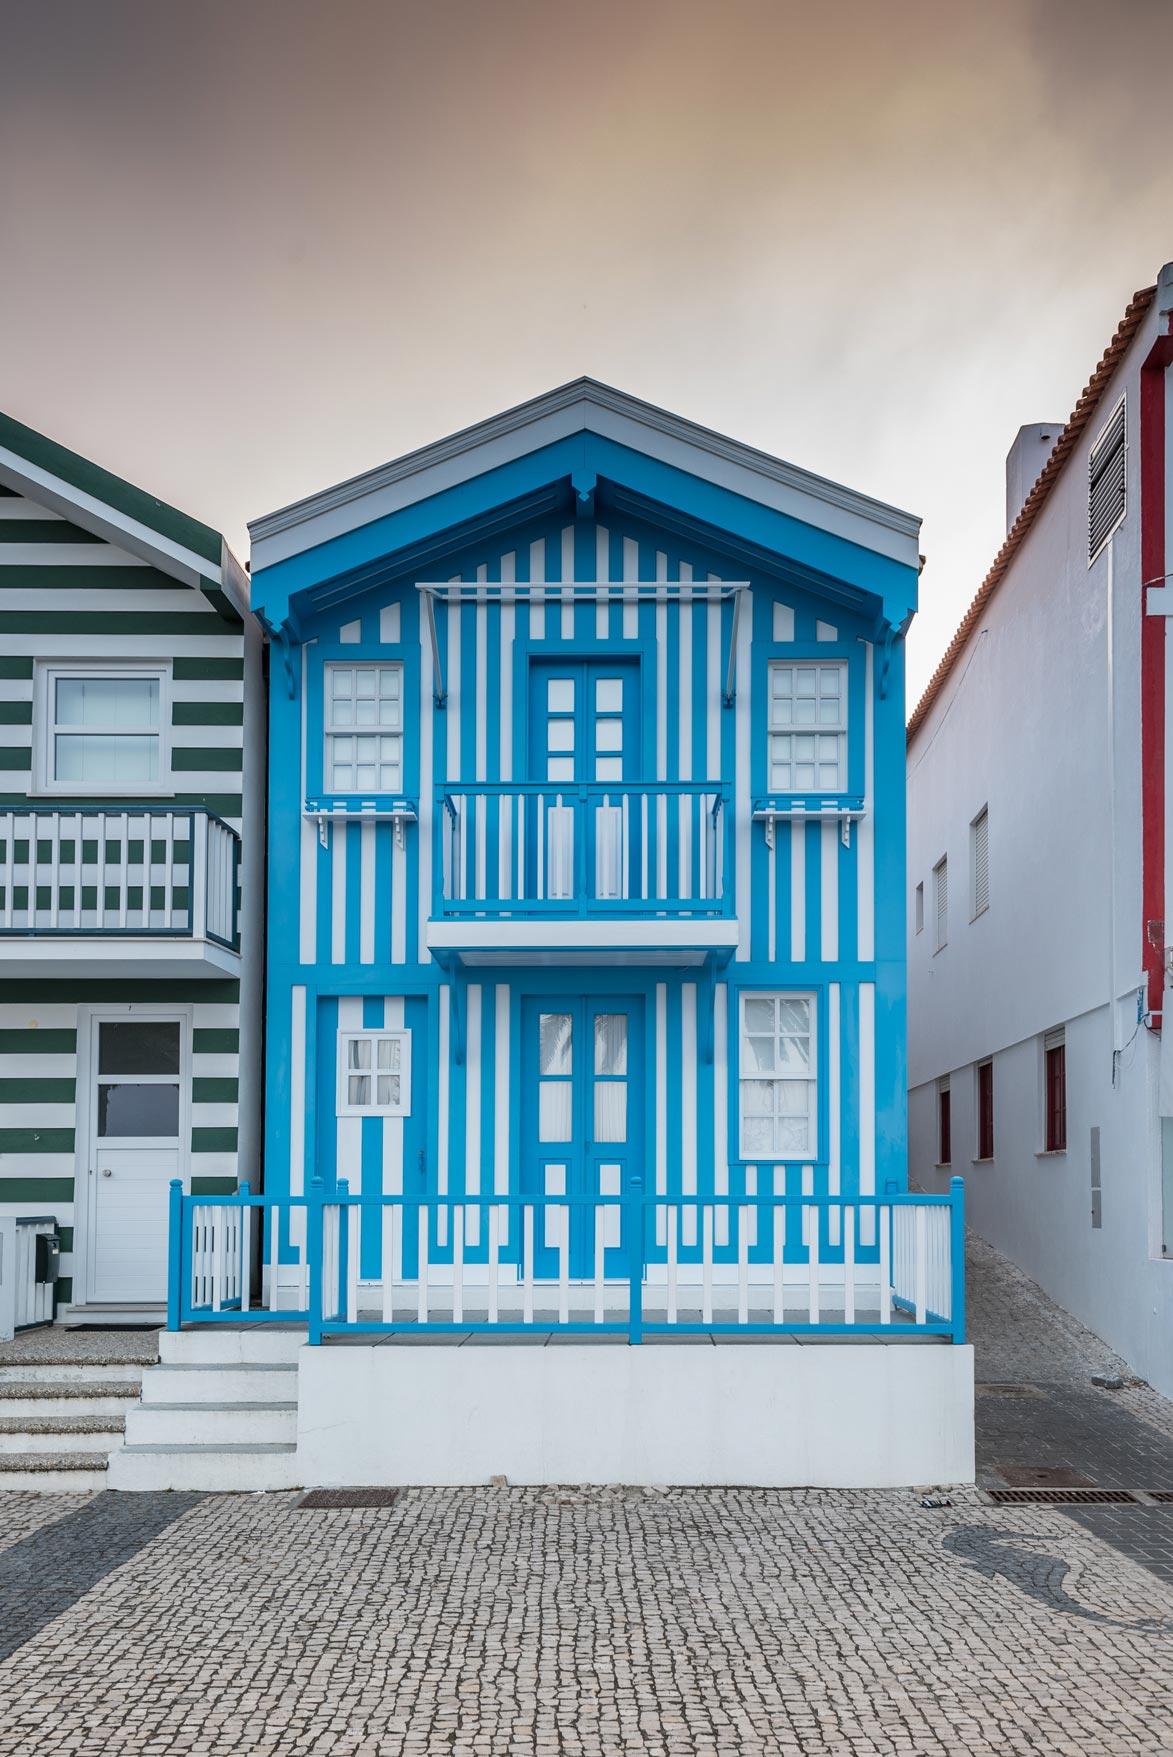 Paesaggi-Portogallo - DSC 2281 - Case a strisce Aveiro - Case a strisce Aveiro